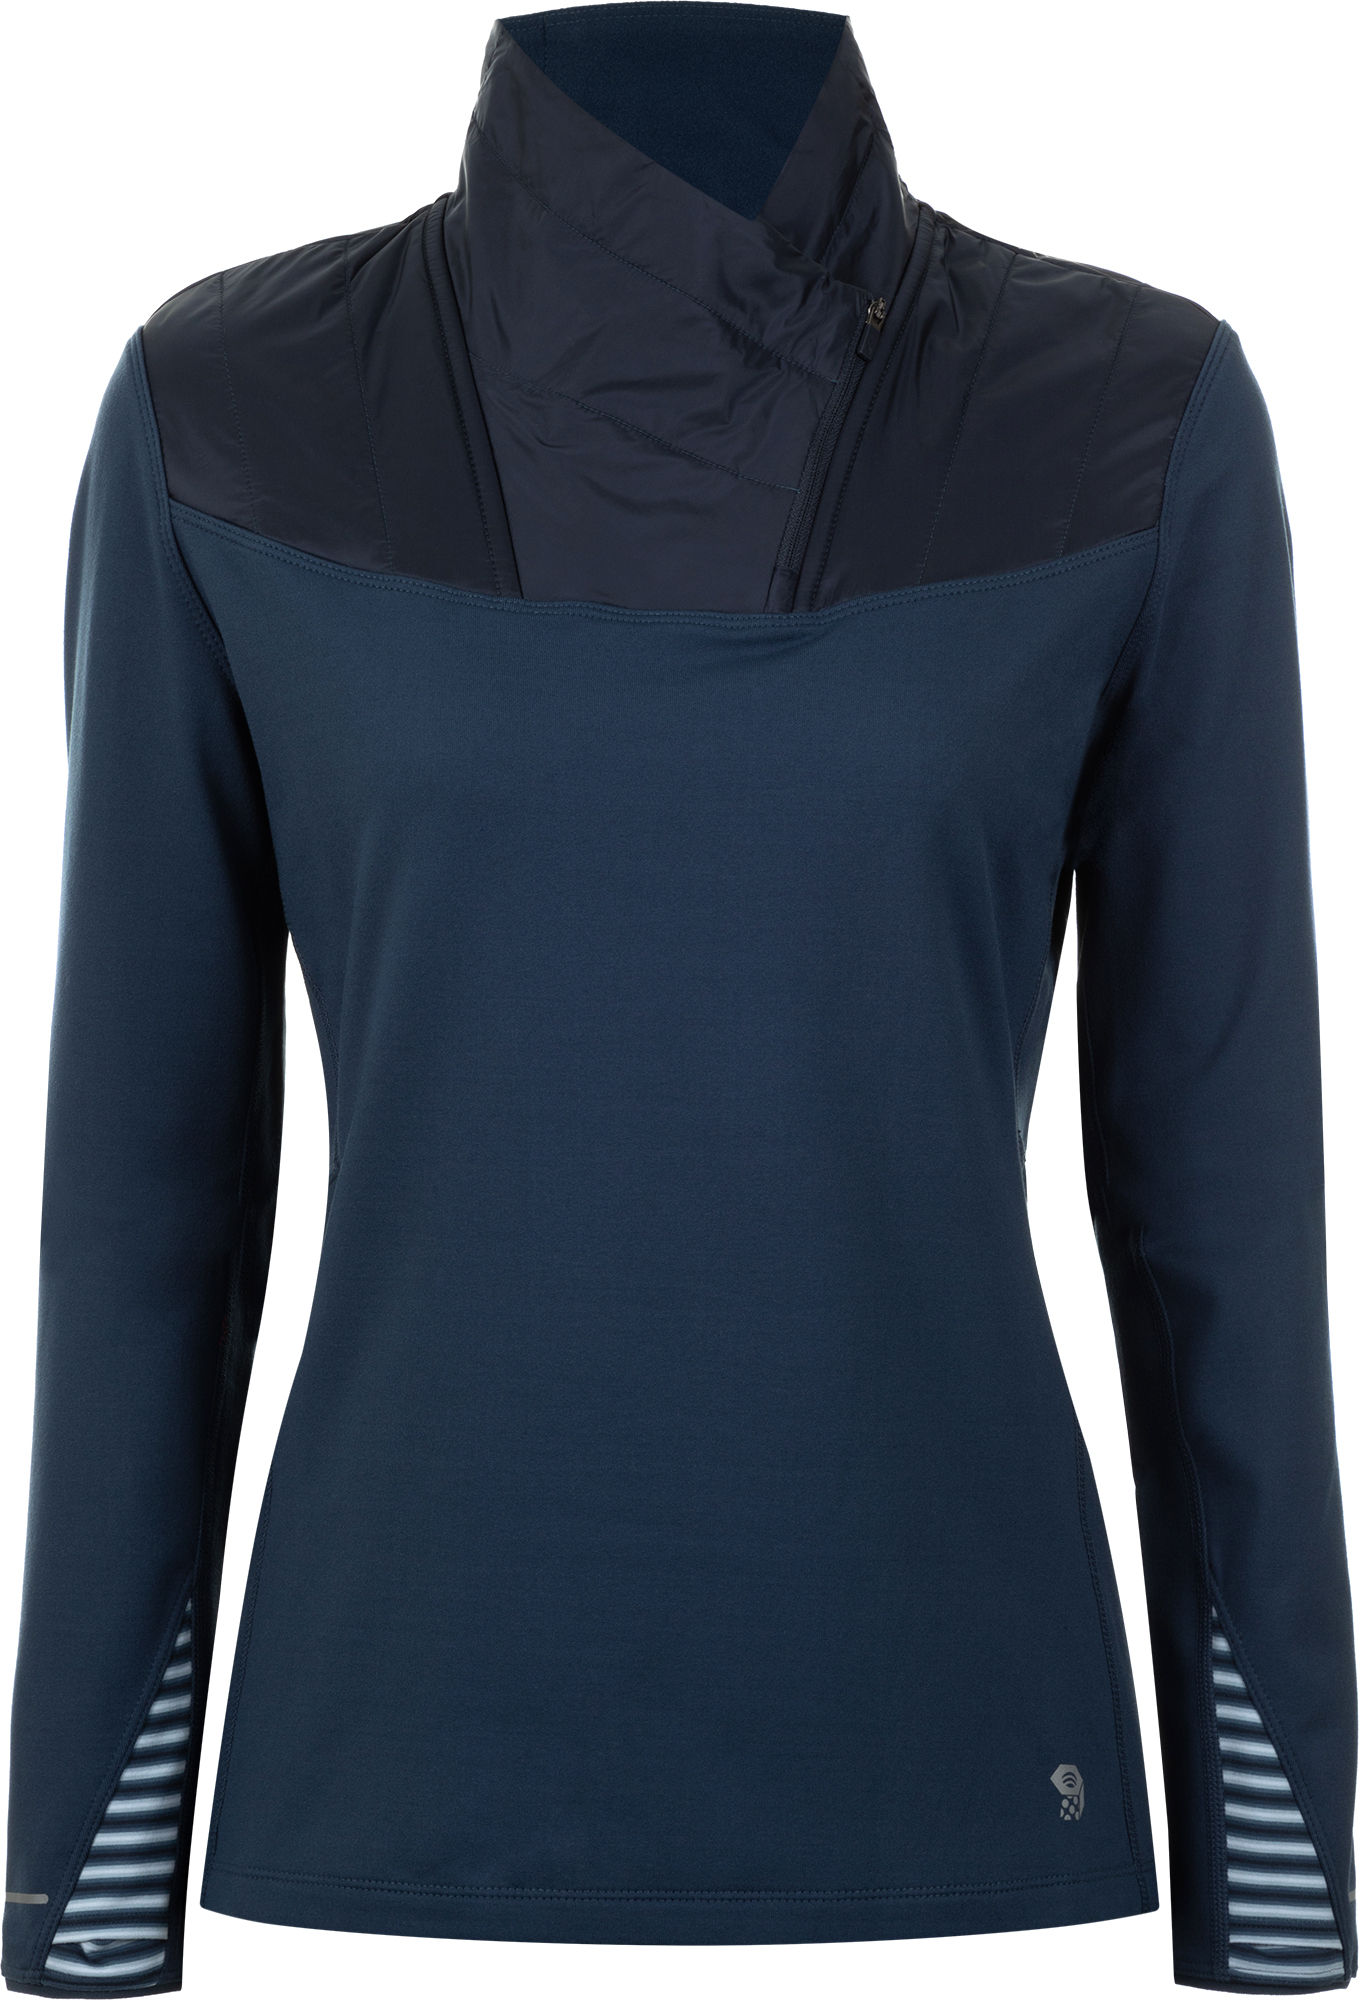 Mountain Hardwear Джемпер женский Mountain Hardwear 32 Degree, размер 48 цена в Москве и Питере